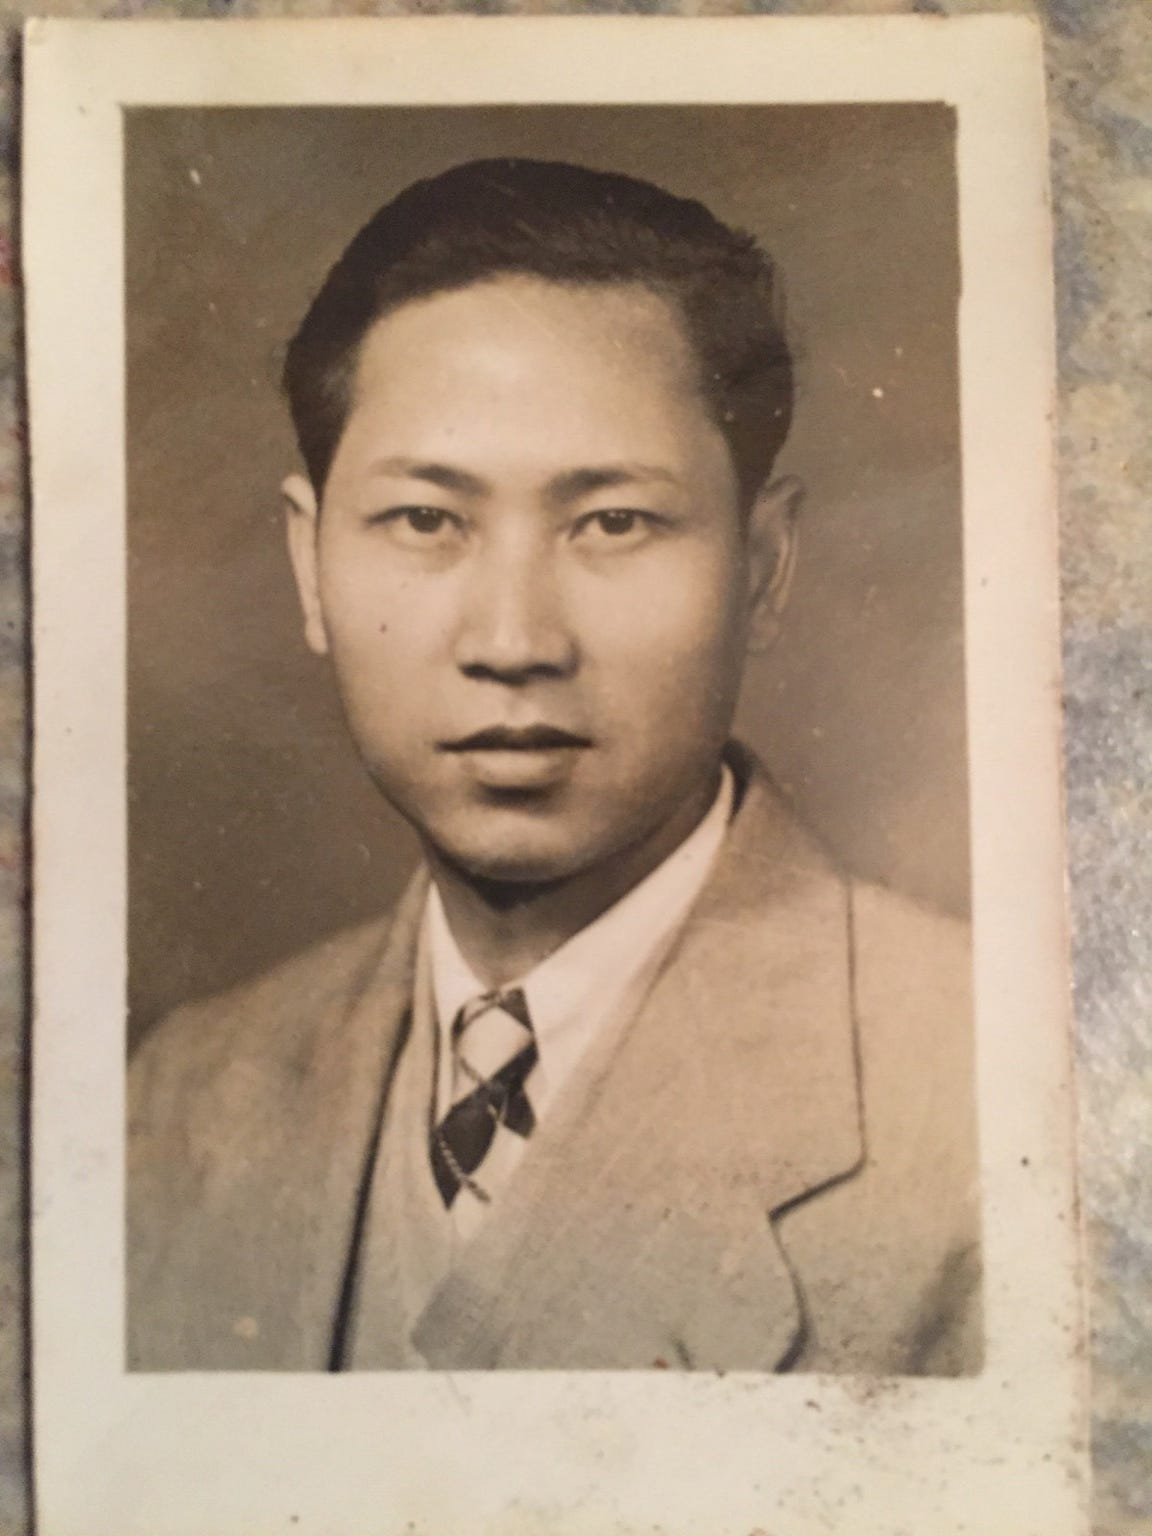 David Leong as a young man.